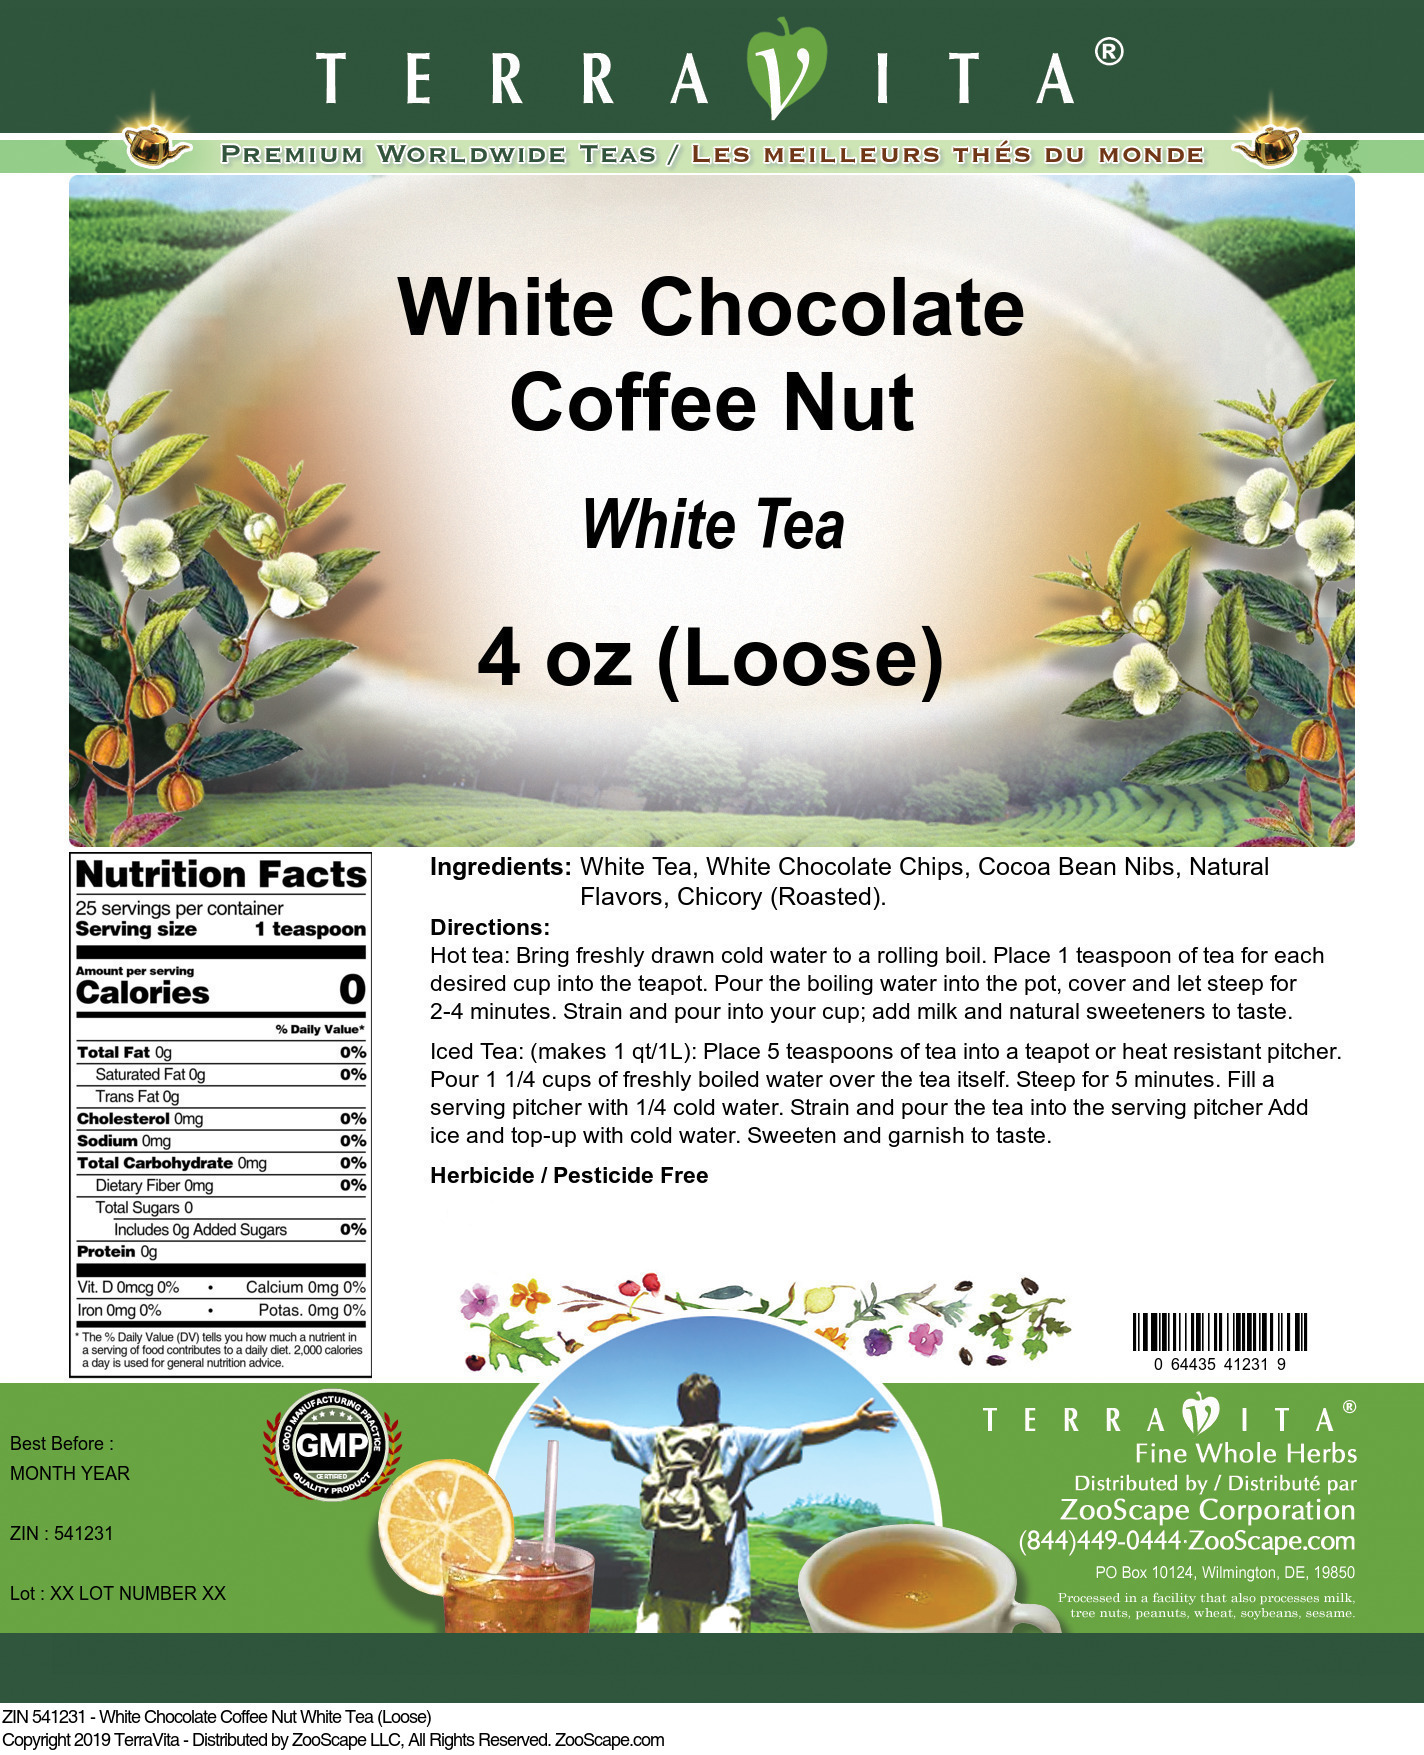 White Chocolate Coffee Nut White Tea (Loose)